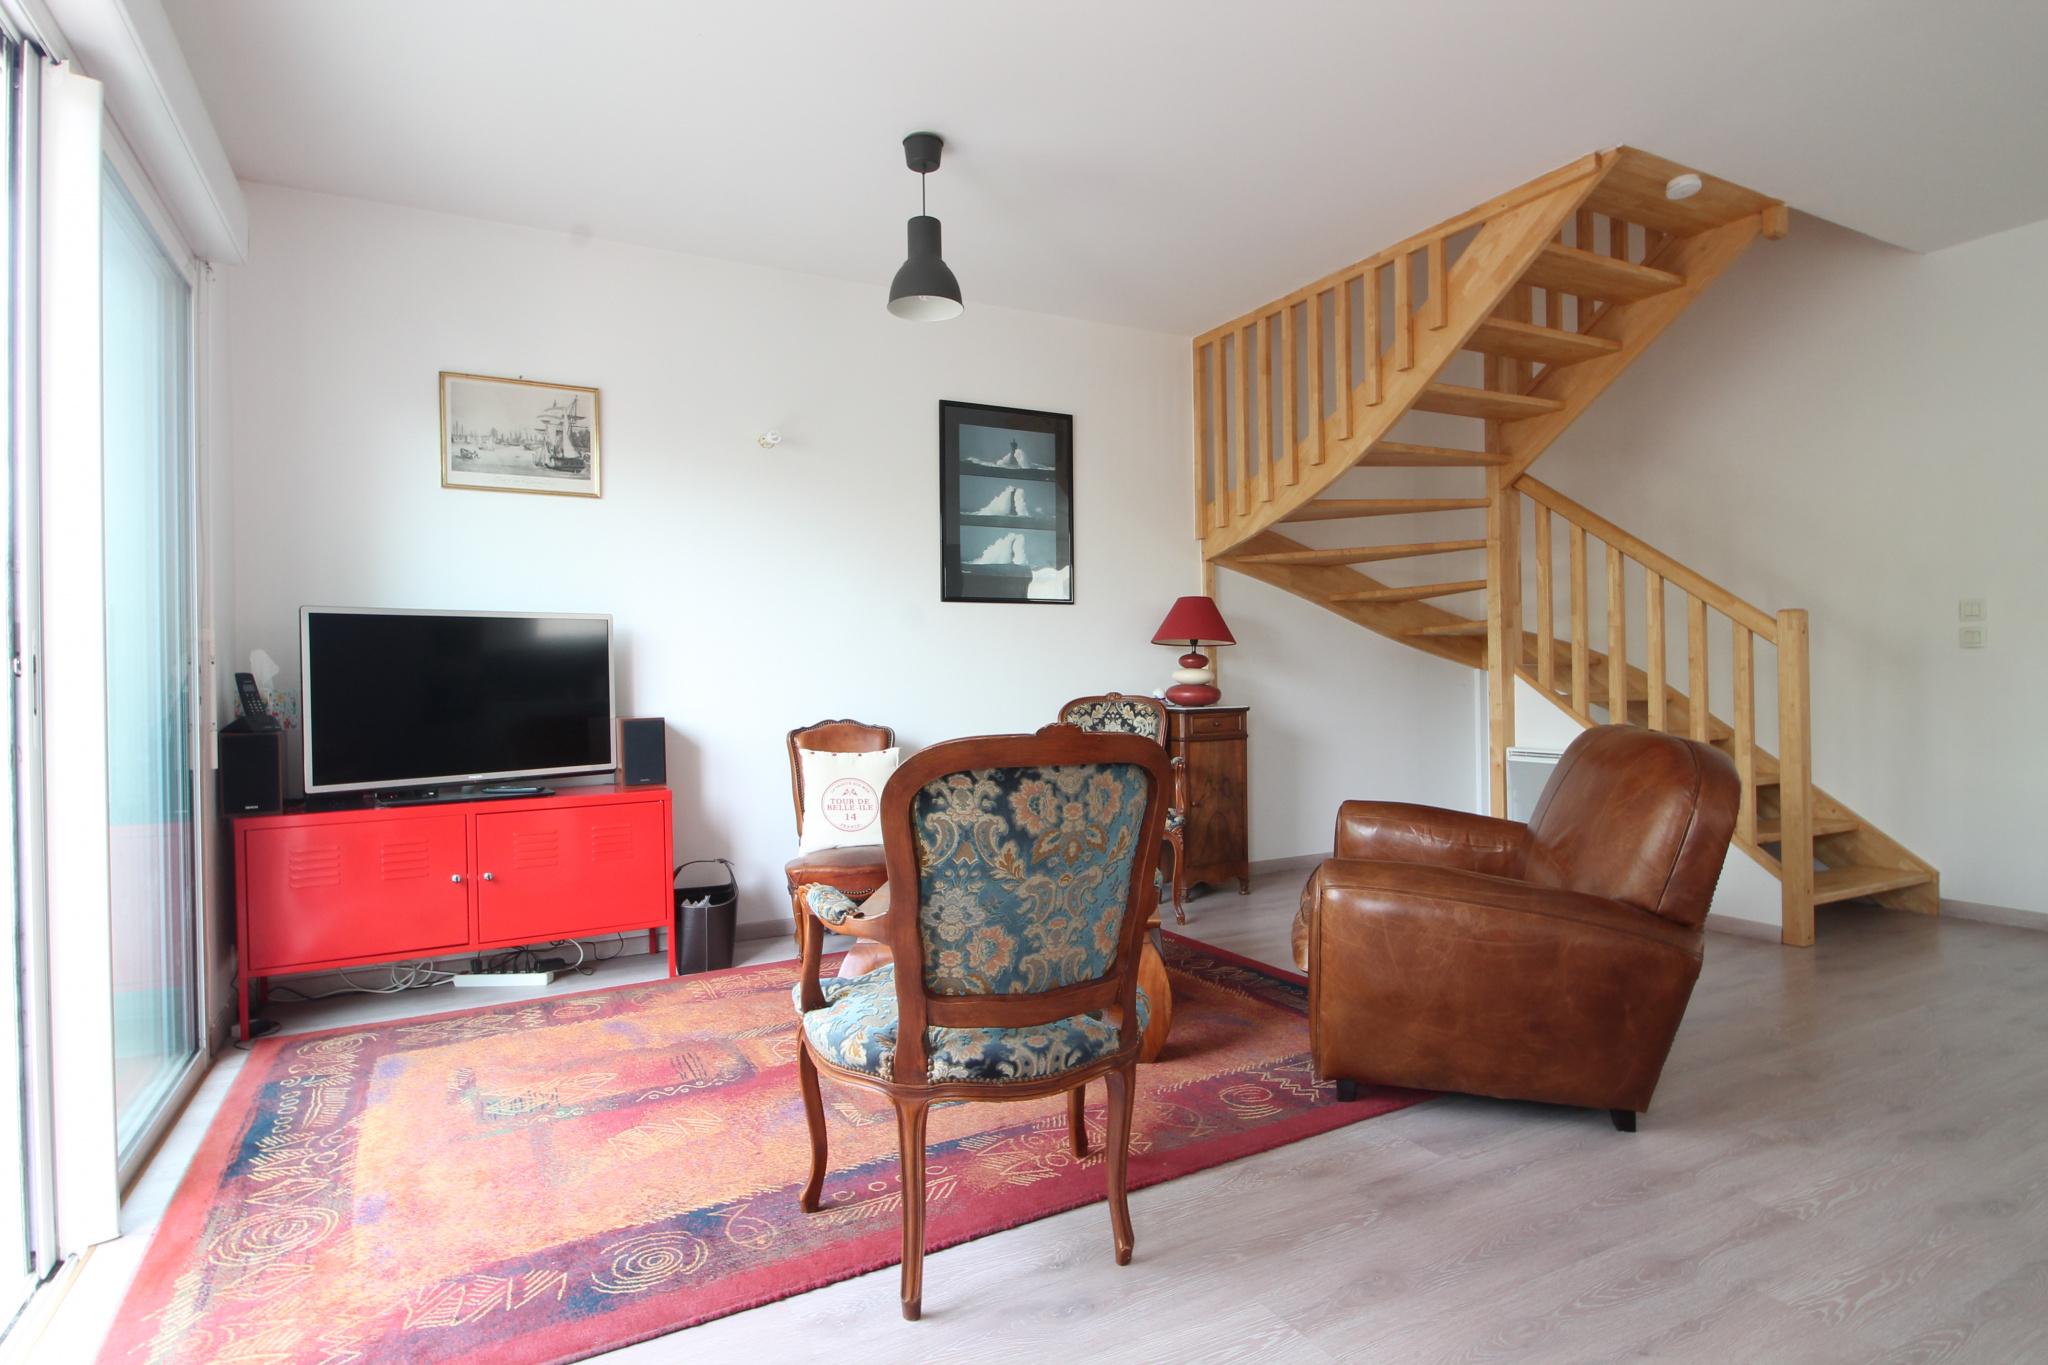 maison/villa la rochelle MAISON-APPARTEMENT - PROCHE COMMODITES